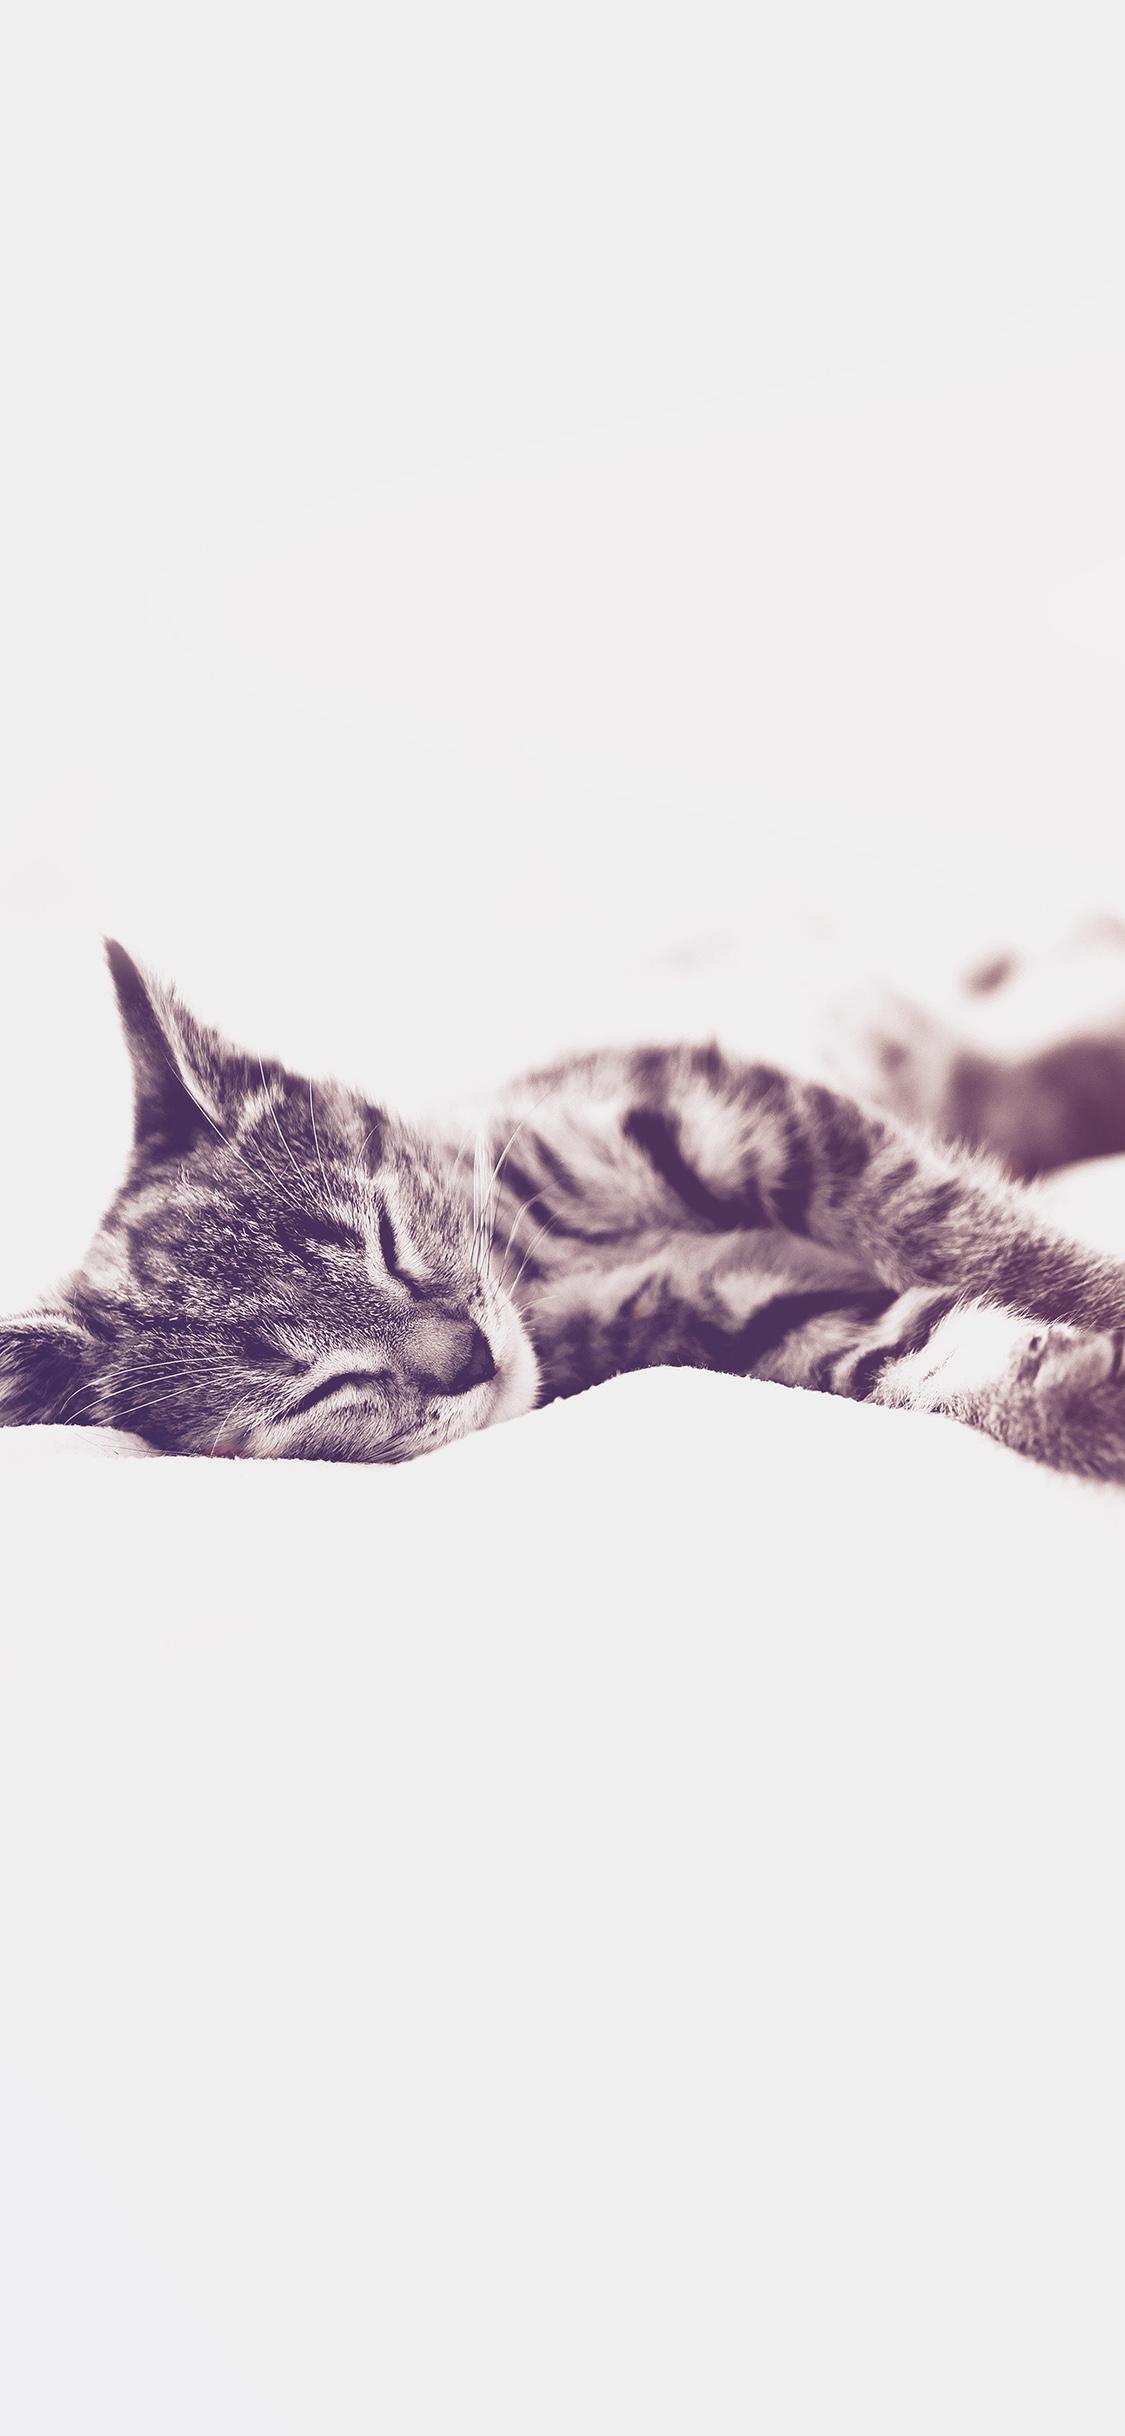 iPhoneXpapers.com-Apple-iPhone-wallpaper-ms26-sleepy-cat-kitten-white-animal-blue